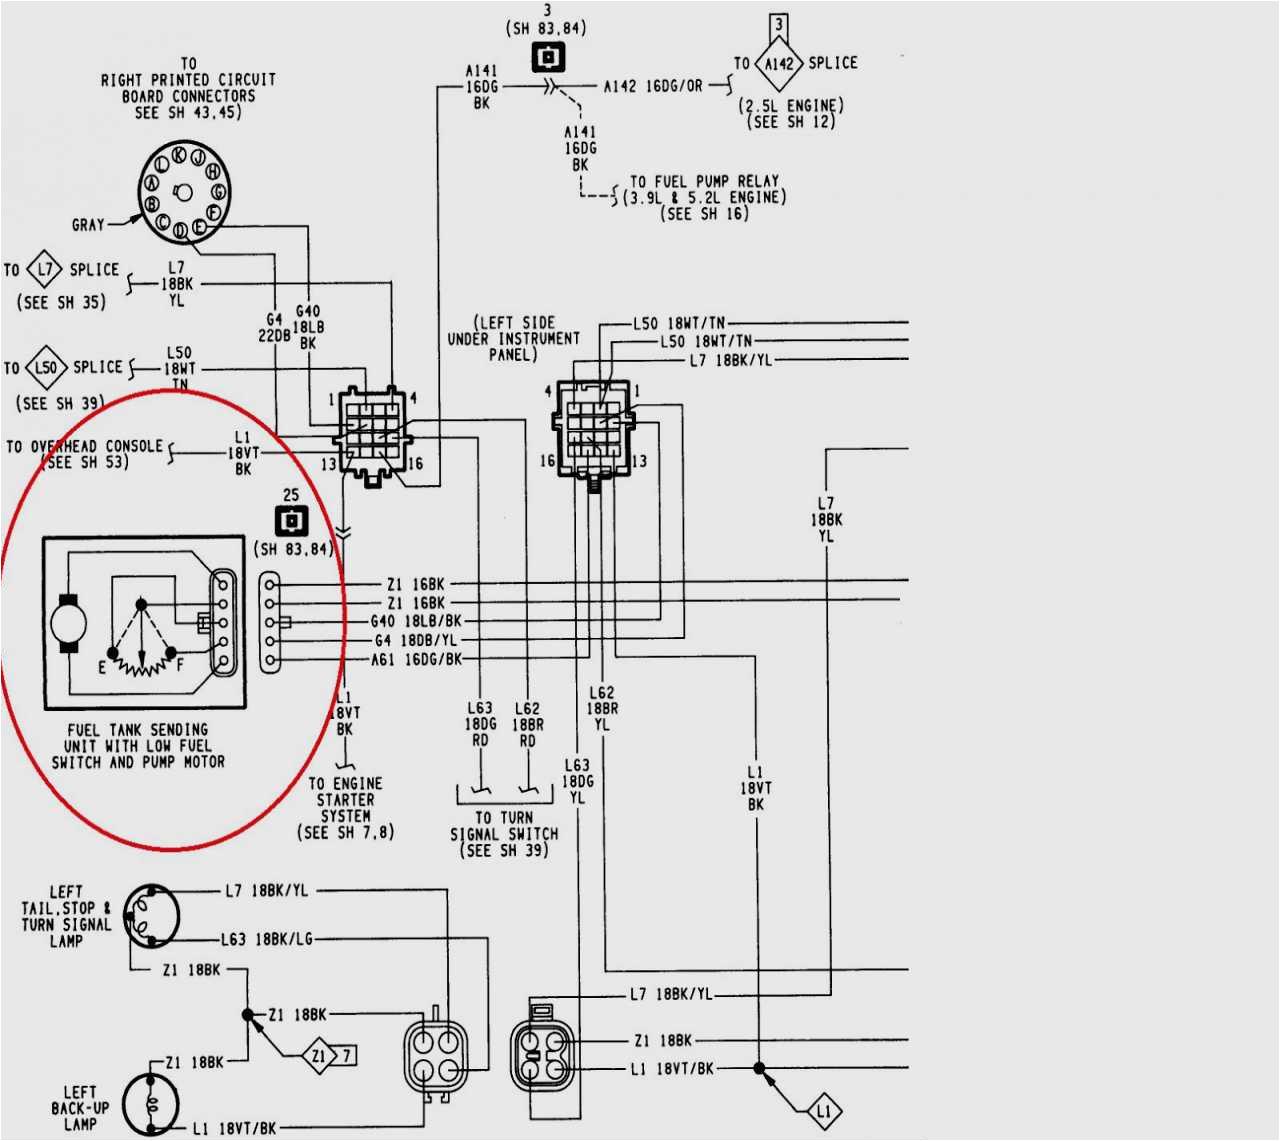 rover 75 fuel gauge wiring diagram wiring diagram user 1946 plymouth fuel gauge wiring diagram